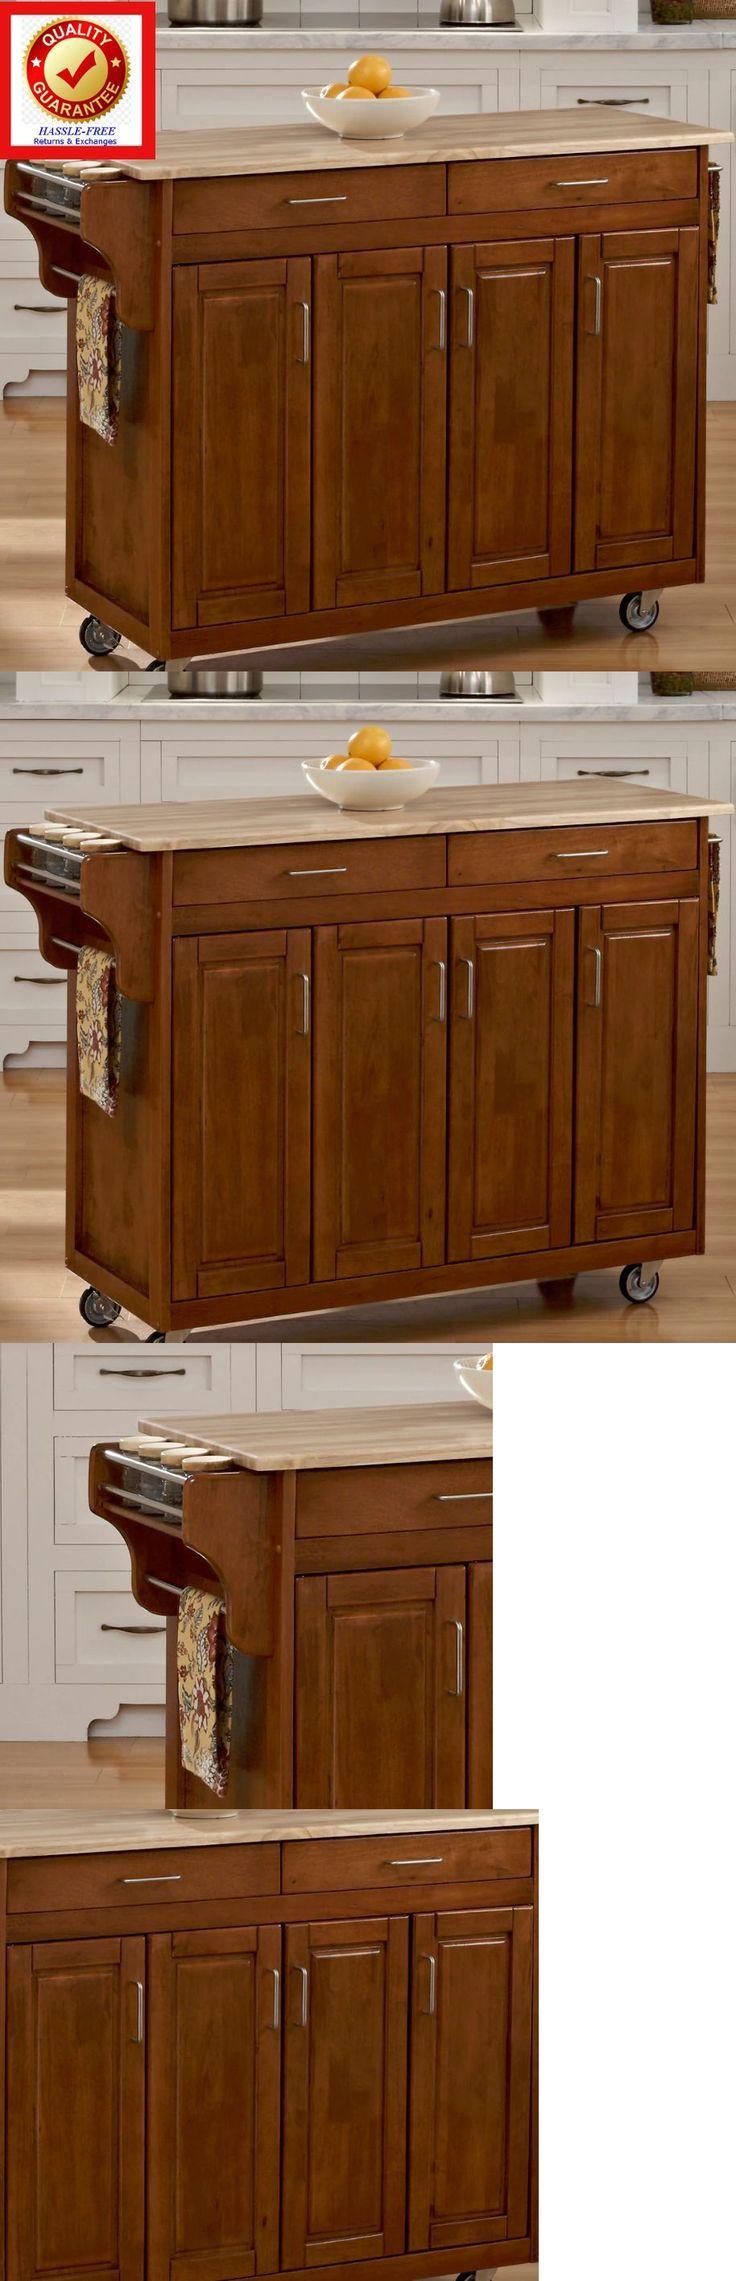 Portable kitchen islands - Kitchen Islands Kitchen Carts 115753 Kitchen Cart Portable Kitchen Island Cottage Oak Finish Built W